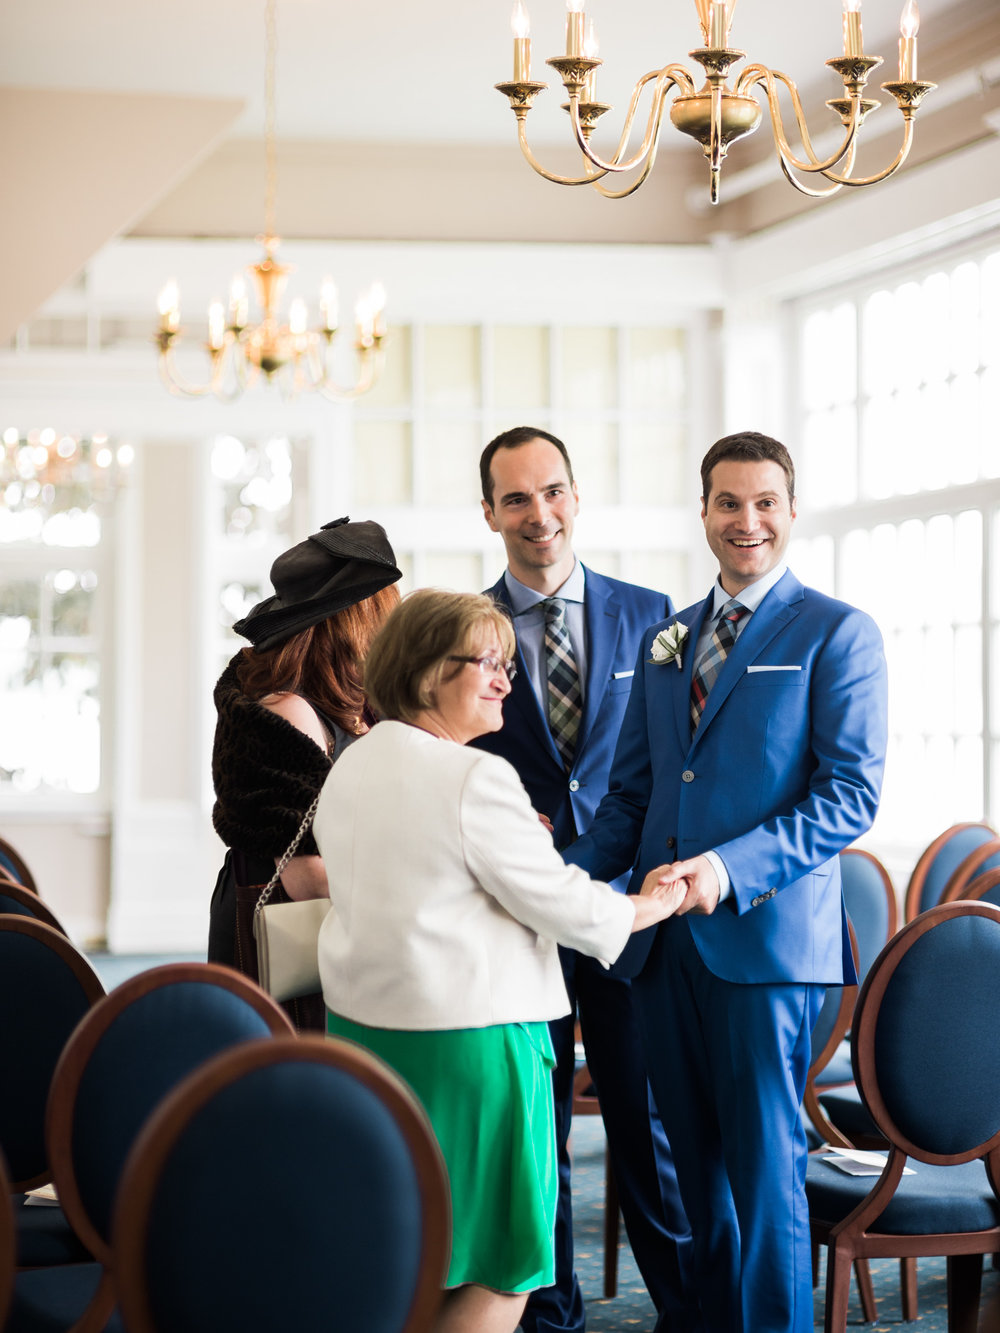 toronto-island-Royal-canadian-yacht-club-wedding-photographer-4